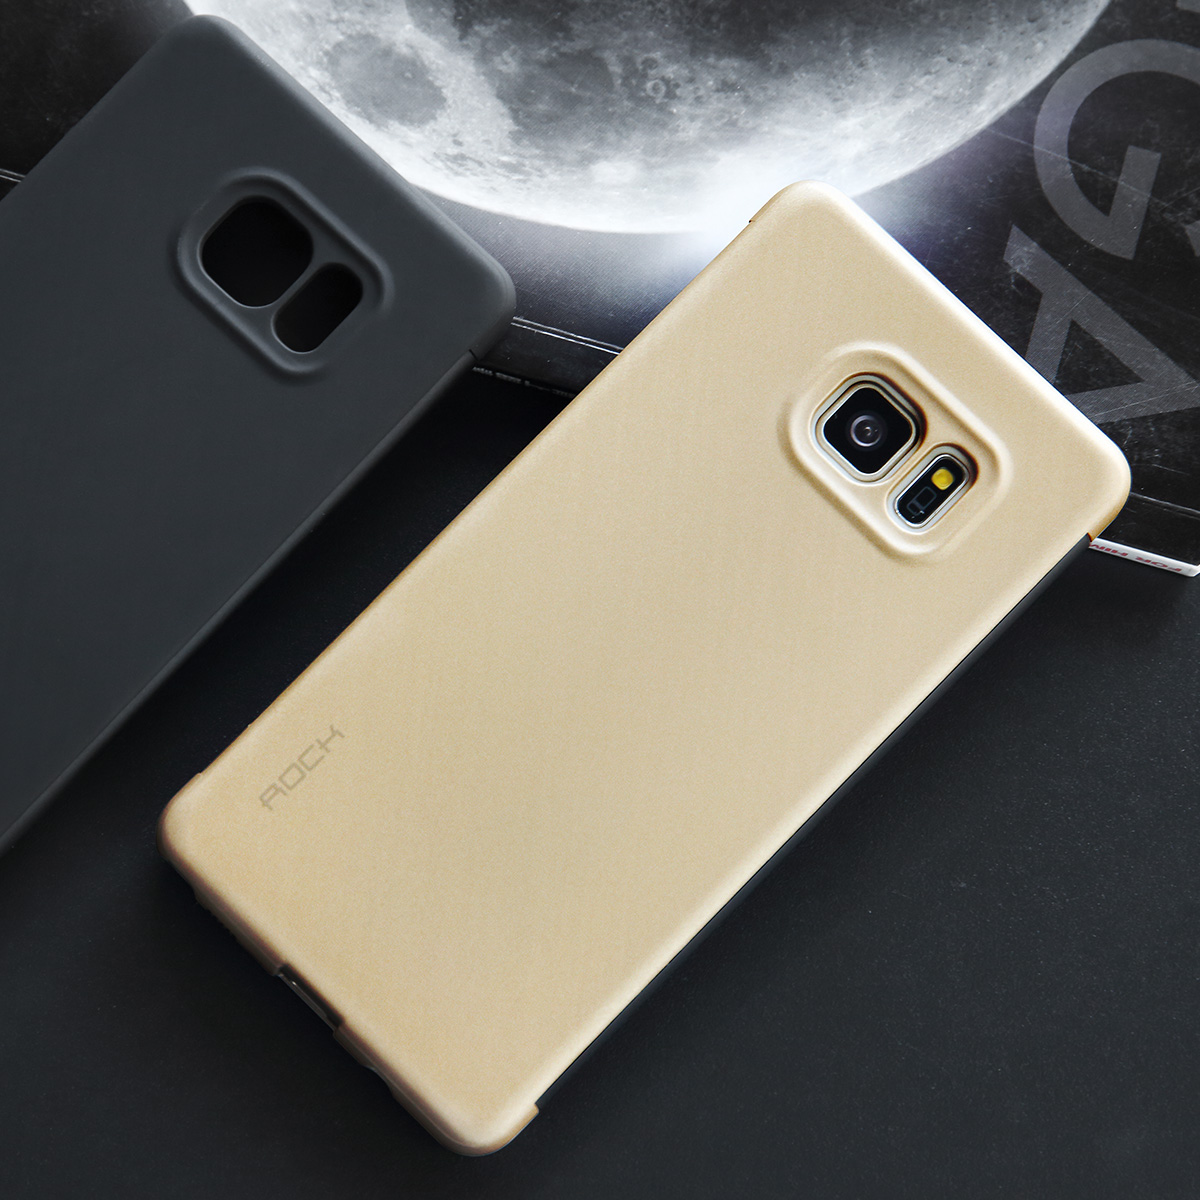 Для Samsung Galaxy Note 7 Чехол ROCK Dr.V Luxury Smart View Full Window Флип Чехол Для Samsung Note FE ТПУ + ПК Телефон Чехлы